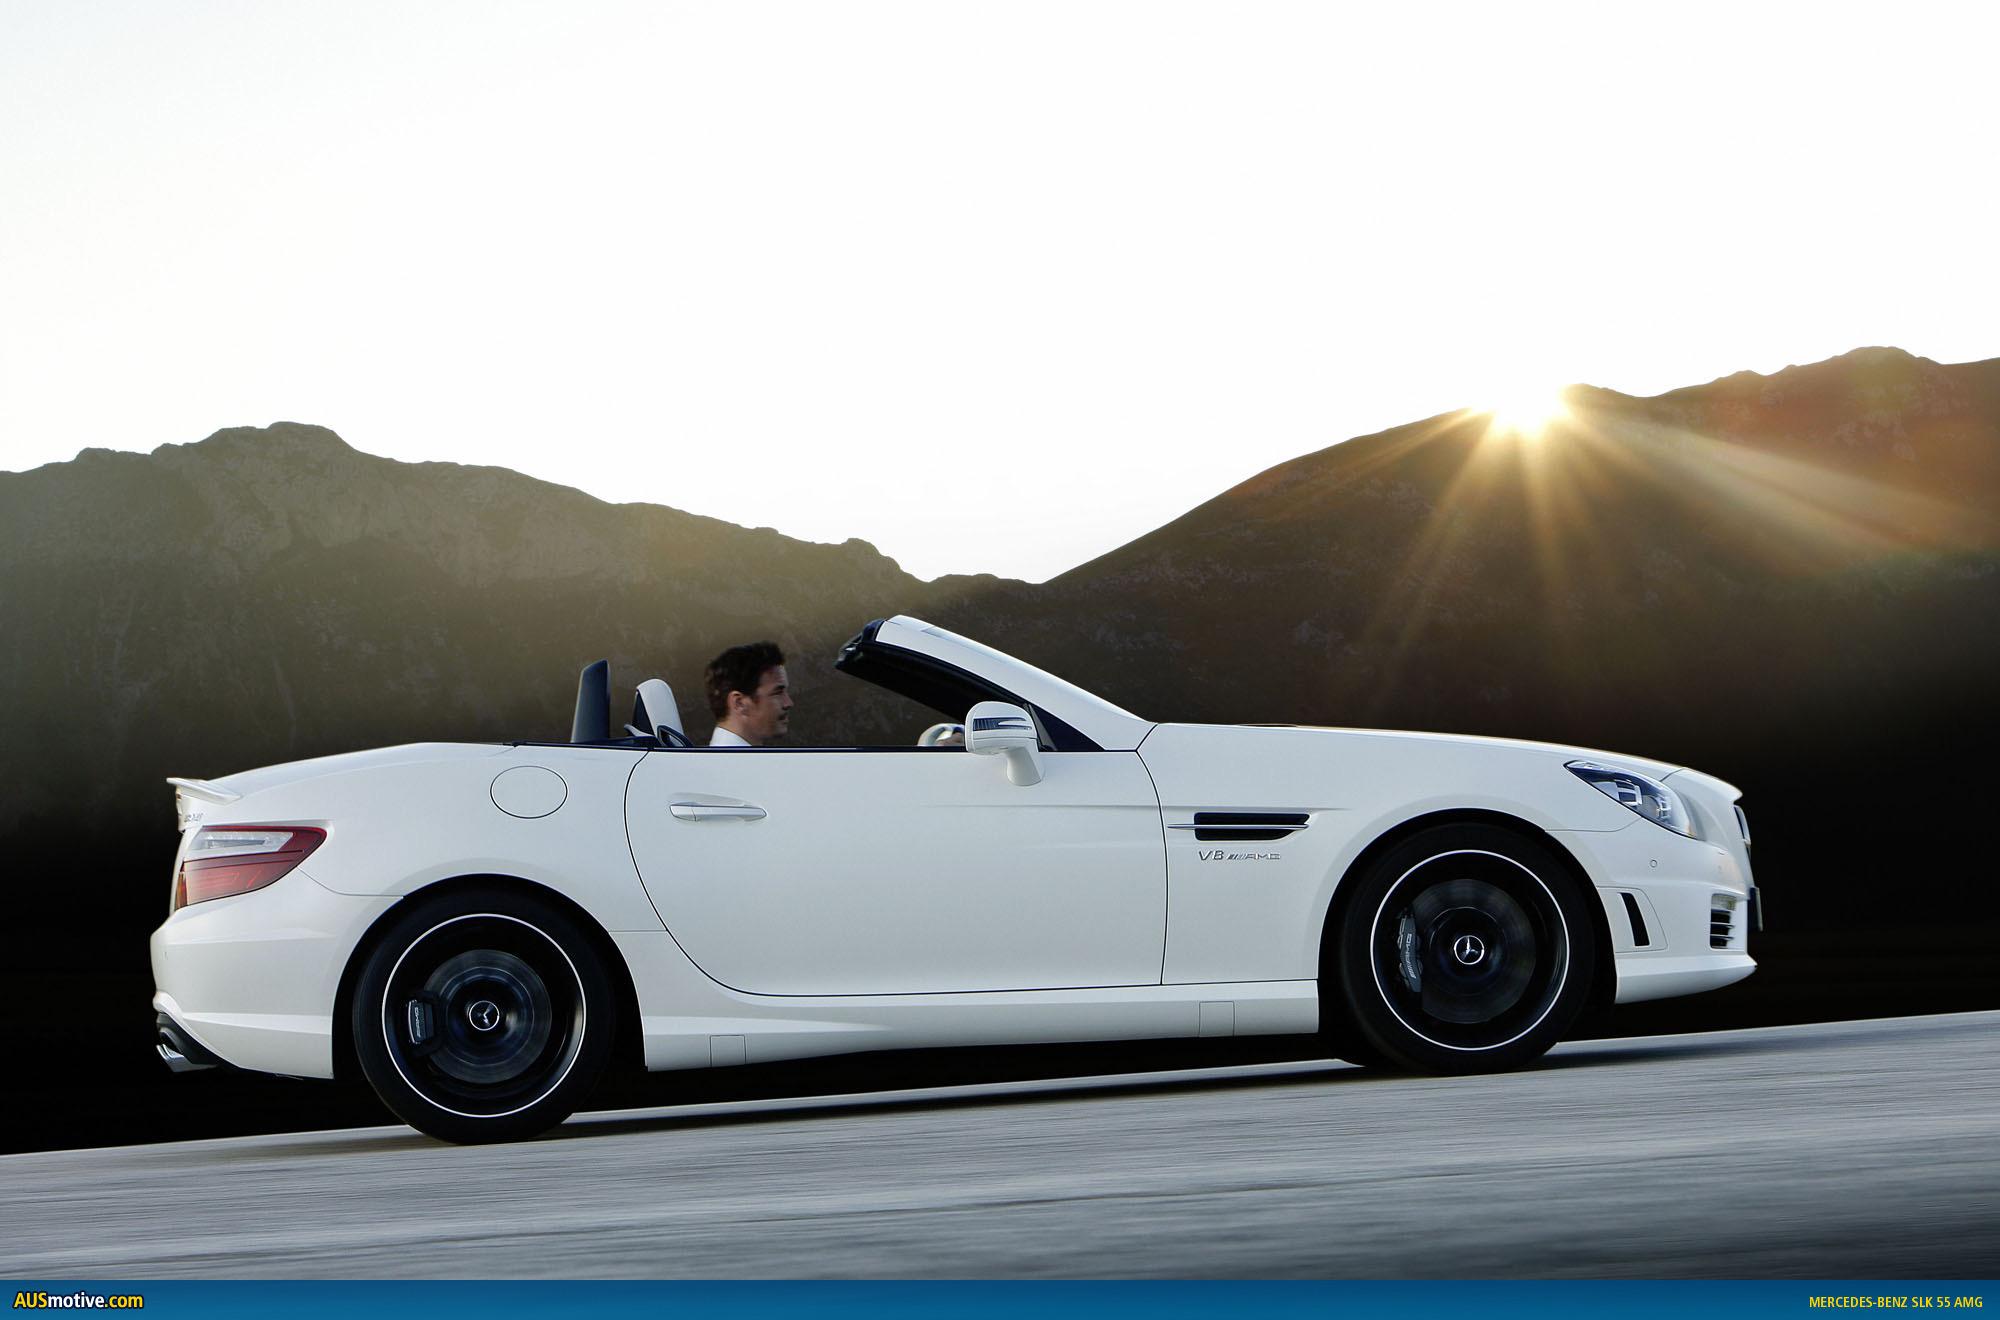 Mercedes benz slk 55 amg australian pricing for Mercedes benz mbrace cost